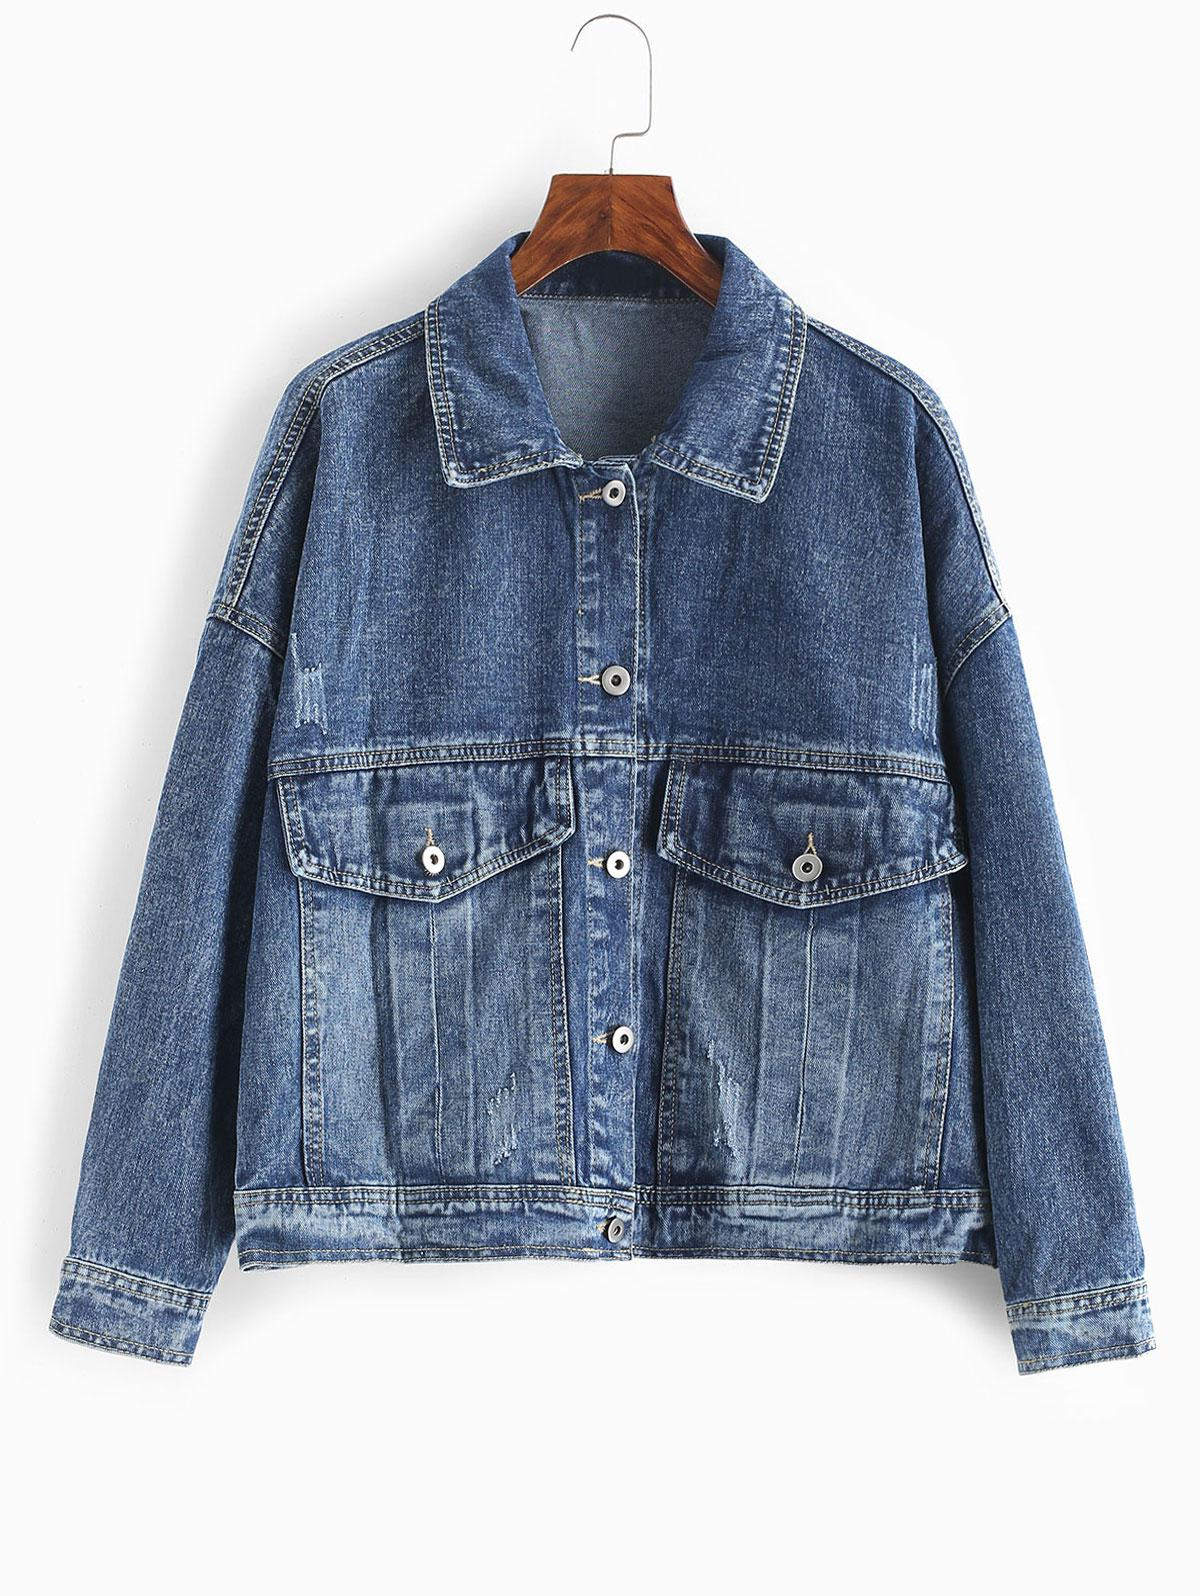 Flap Pockets Button Up Denim Jacket